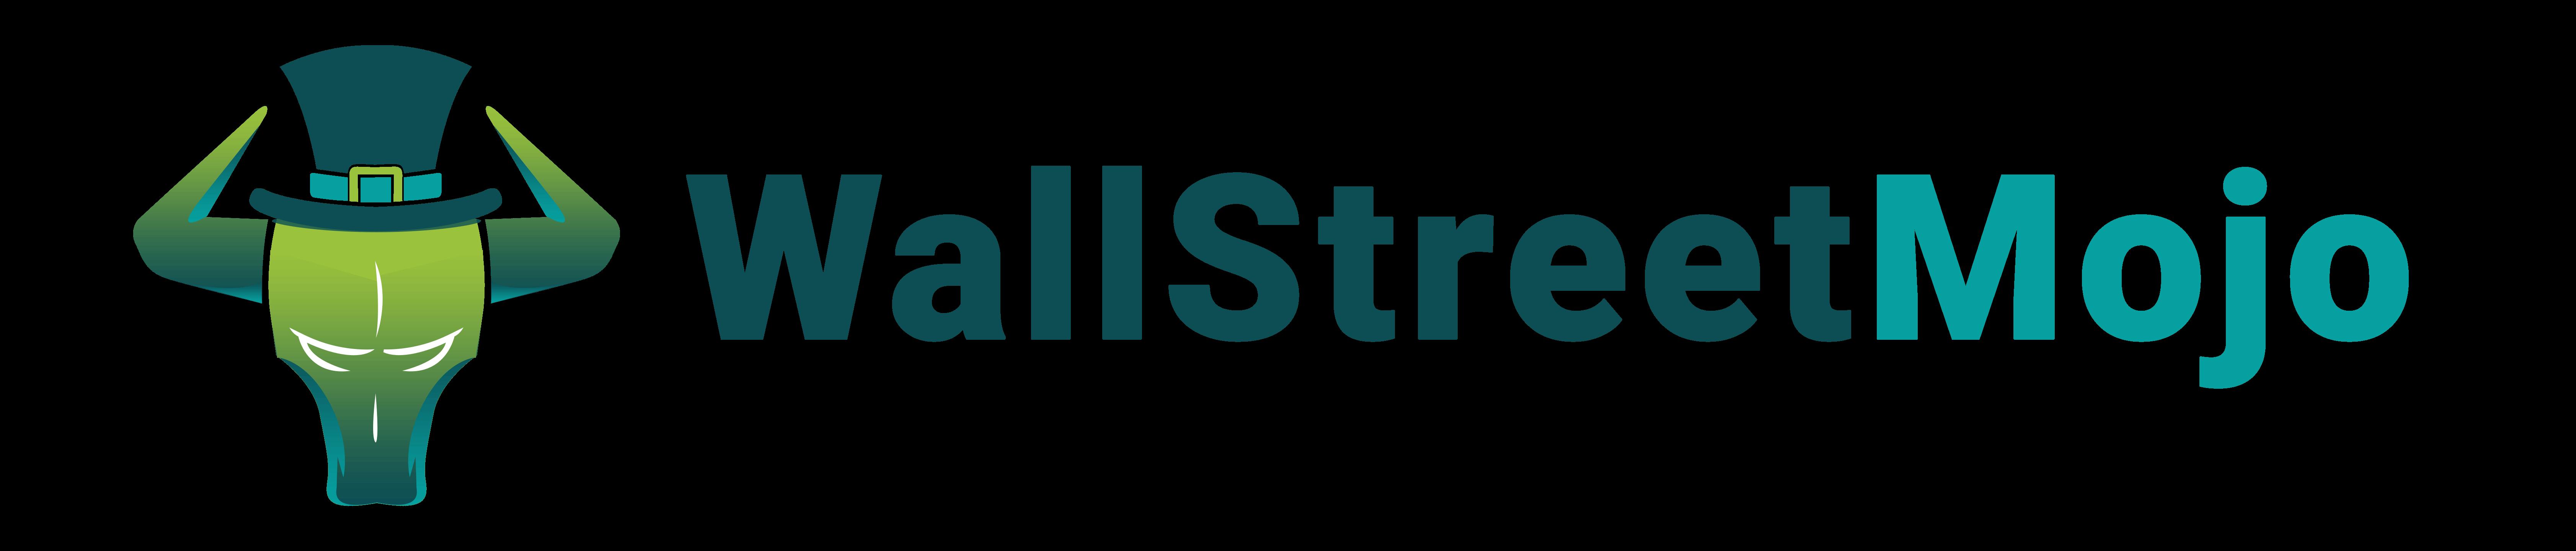 WallStreetMojo